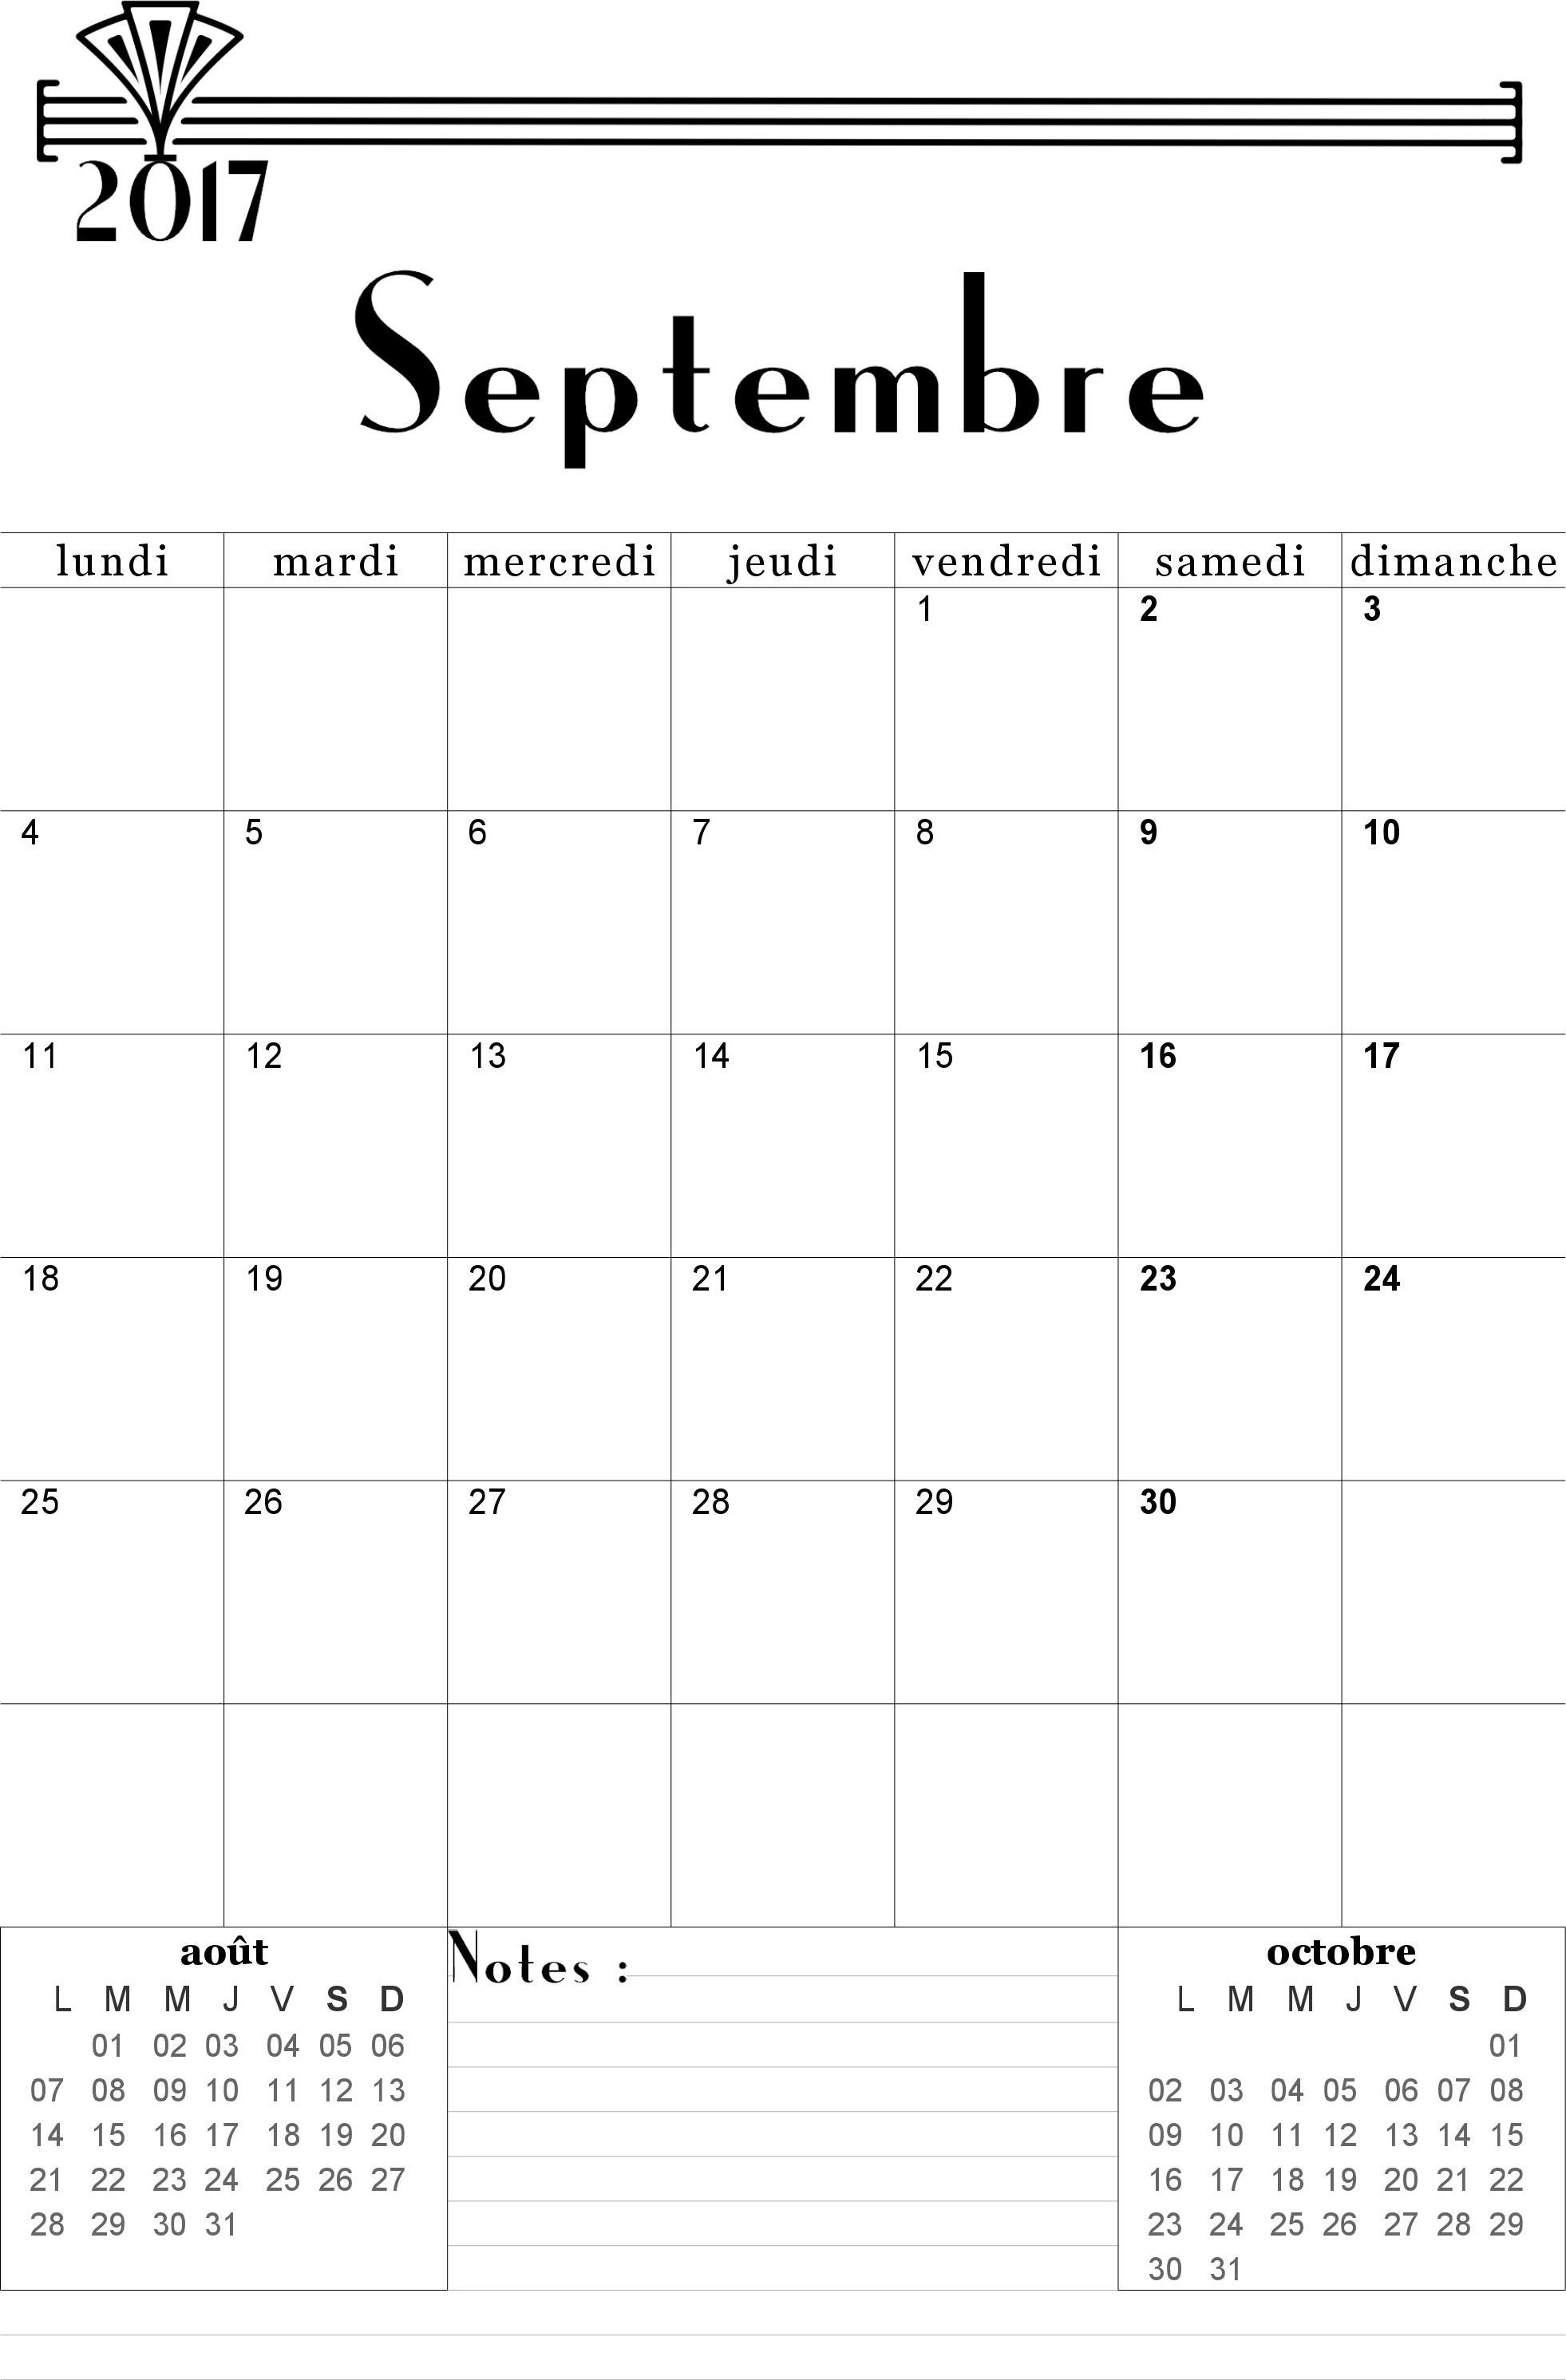 Calendrier 2017 2018 Mensuel à Imprimer Gratuitement